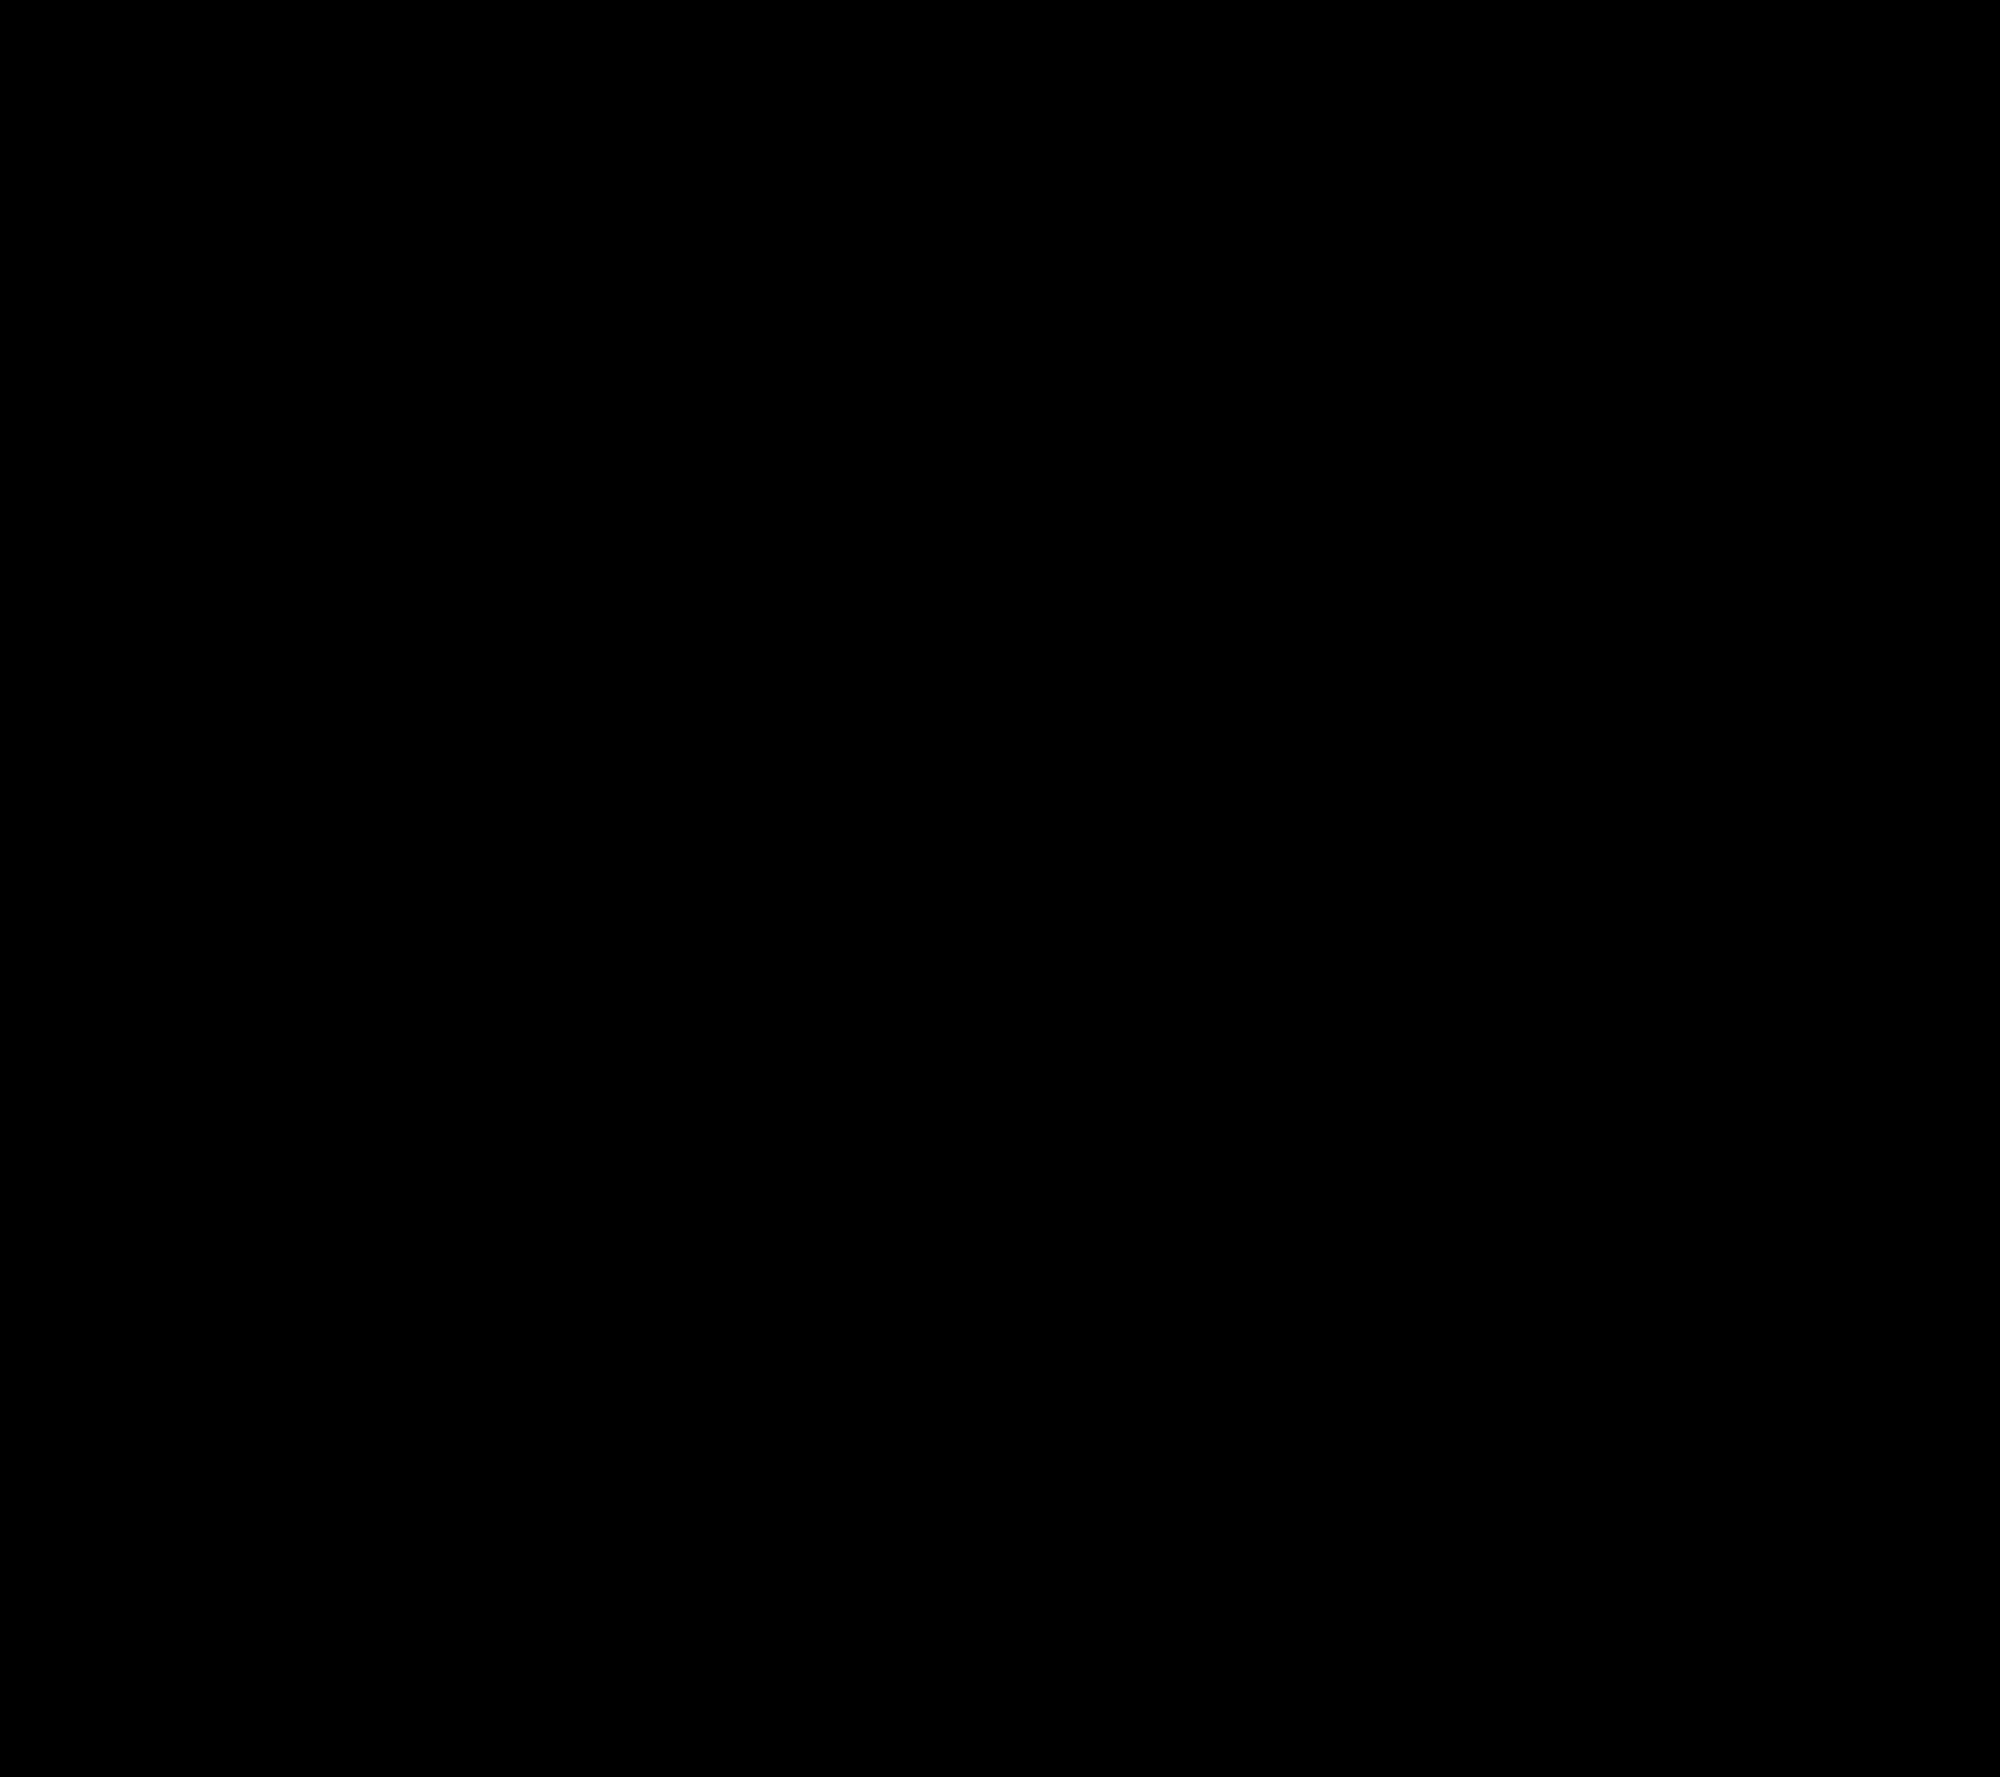 2000x1777 Filehorseicon.svg